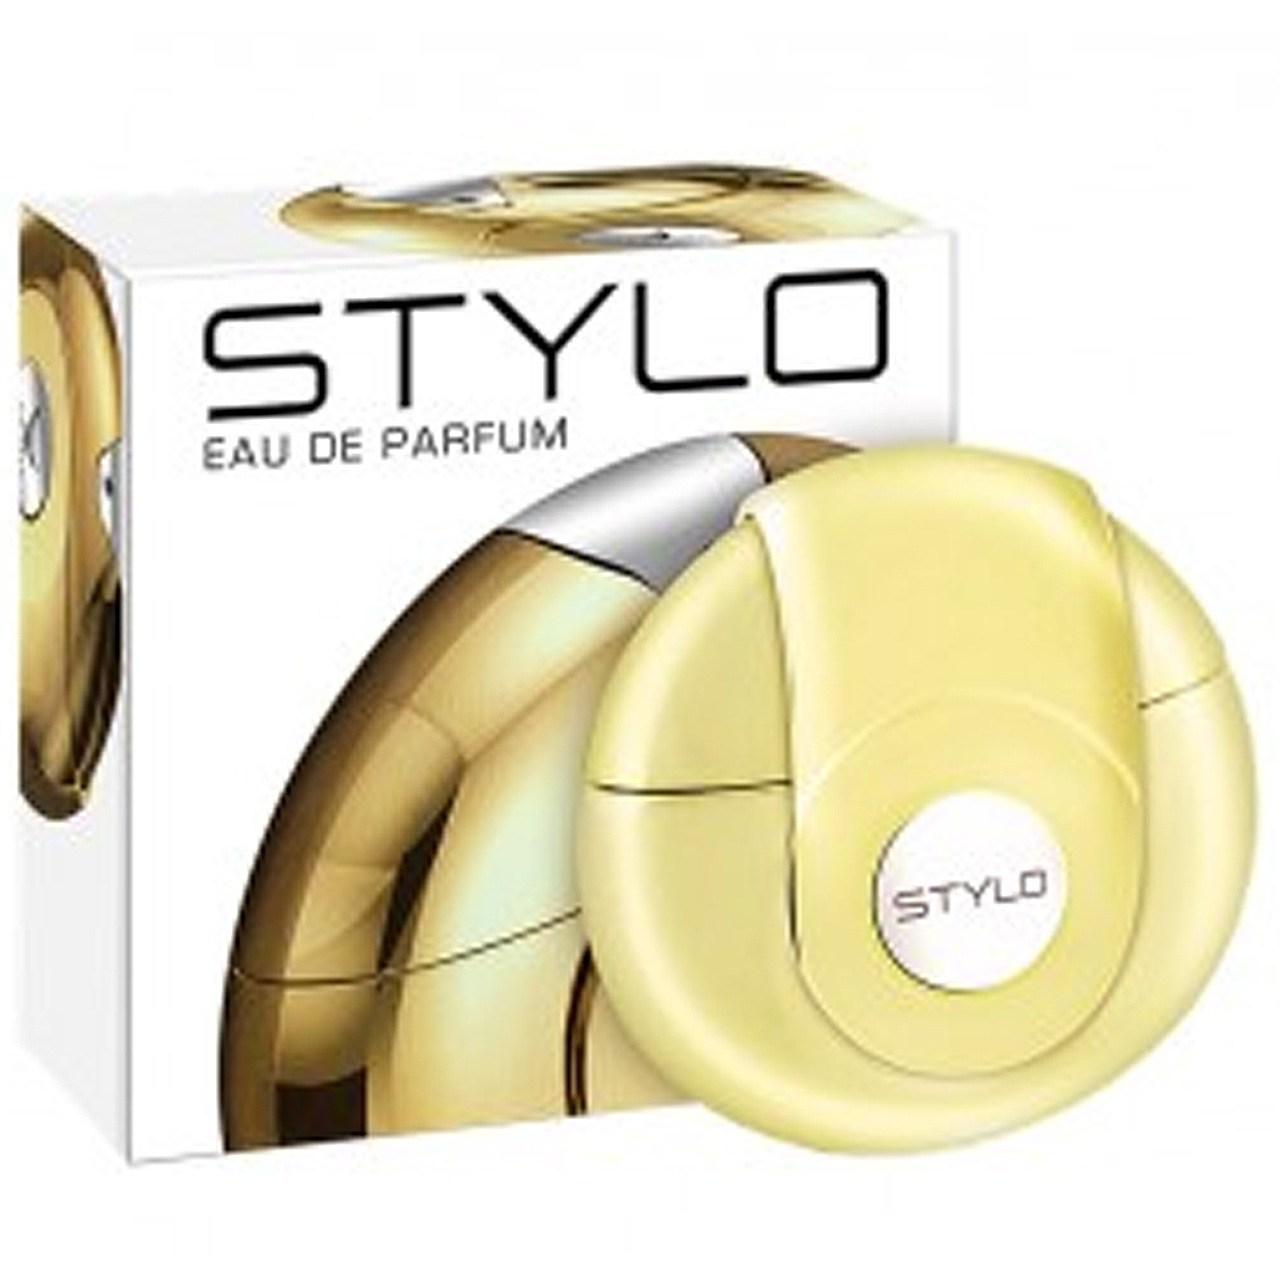 ادو پرفیوم زنانه امپر ویواریا مدل Stylo Pour Femme حجم 80 میلی لیتر